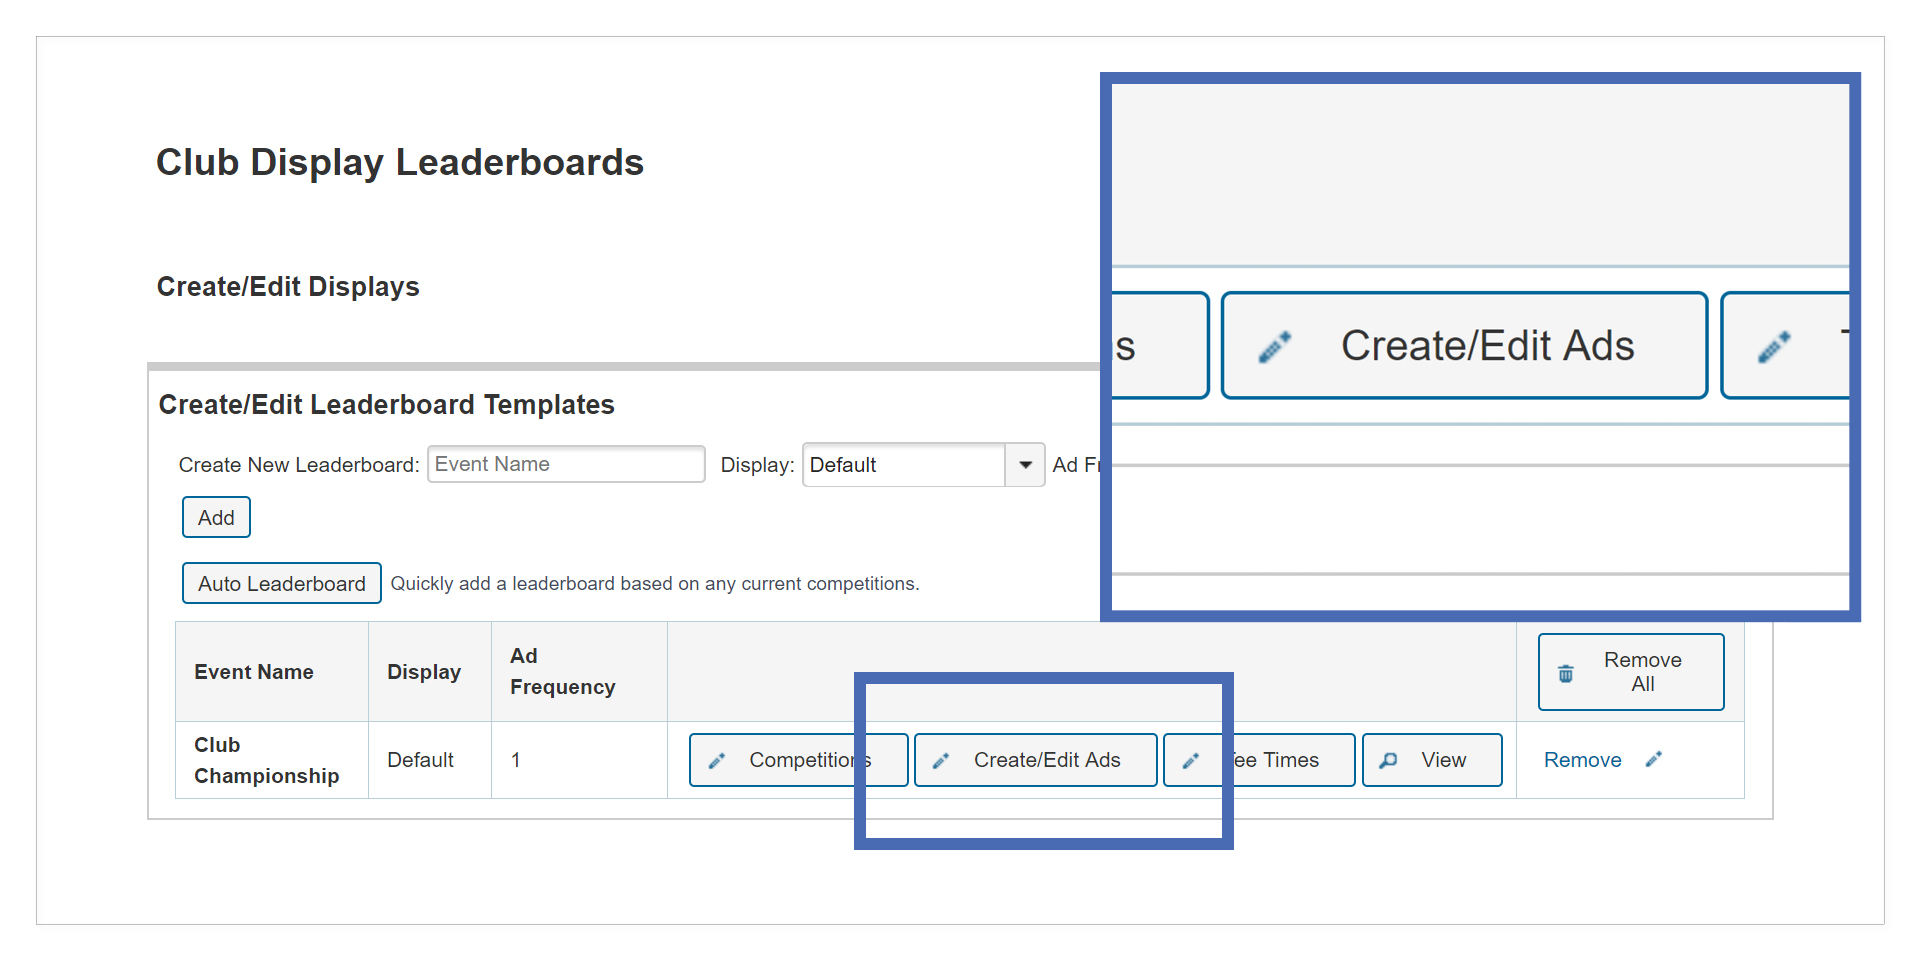 Create/Edit Ads